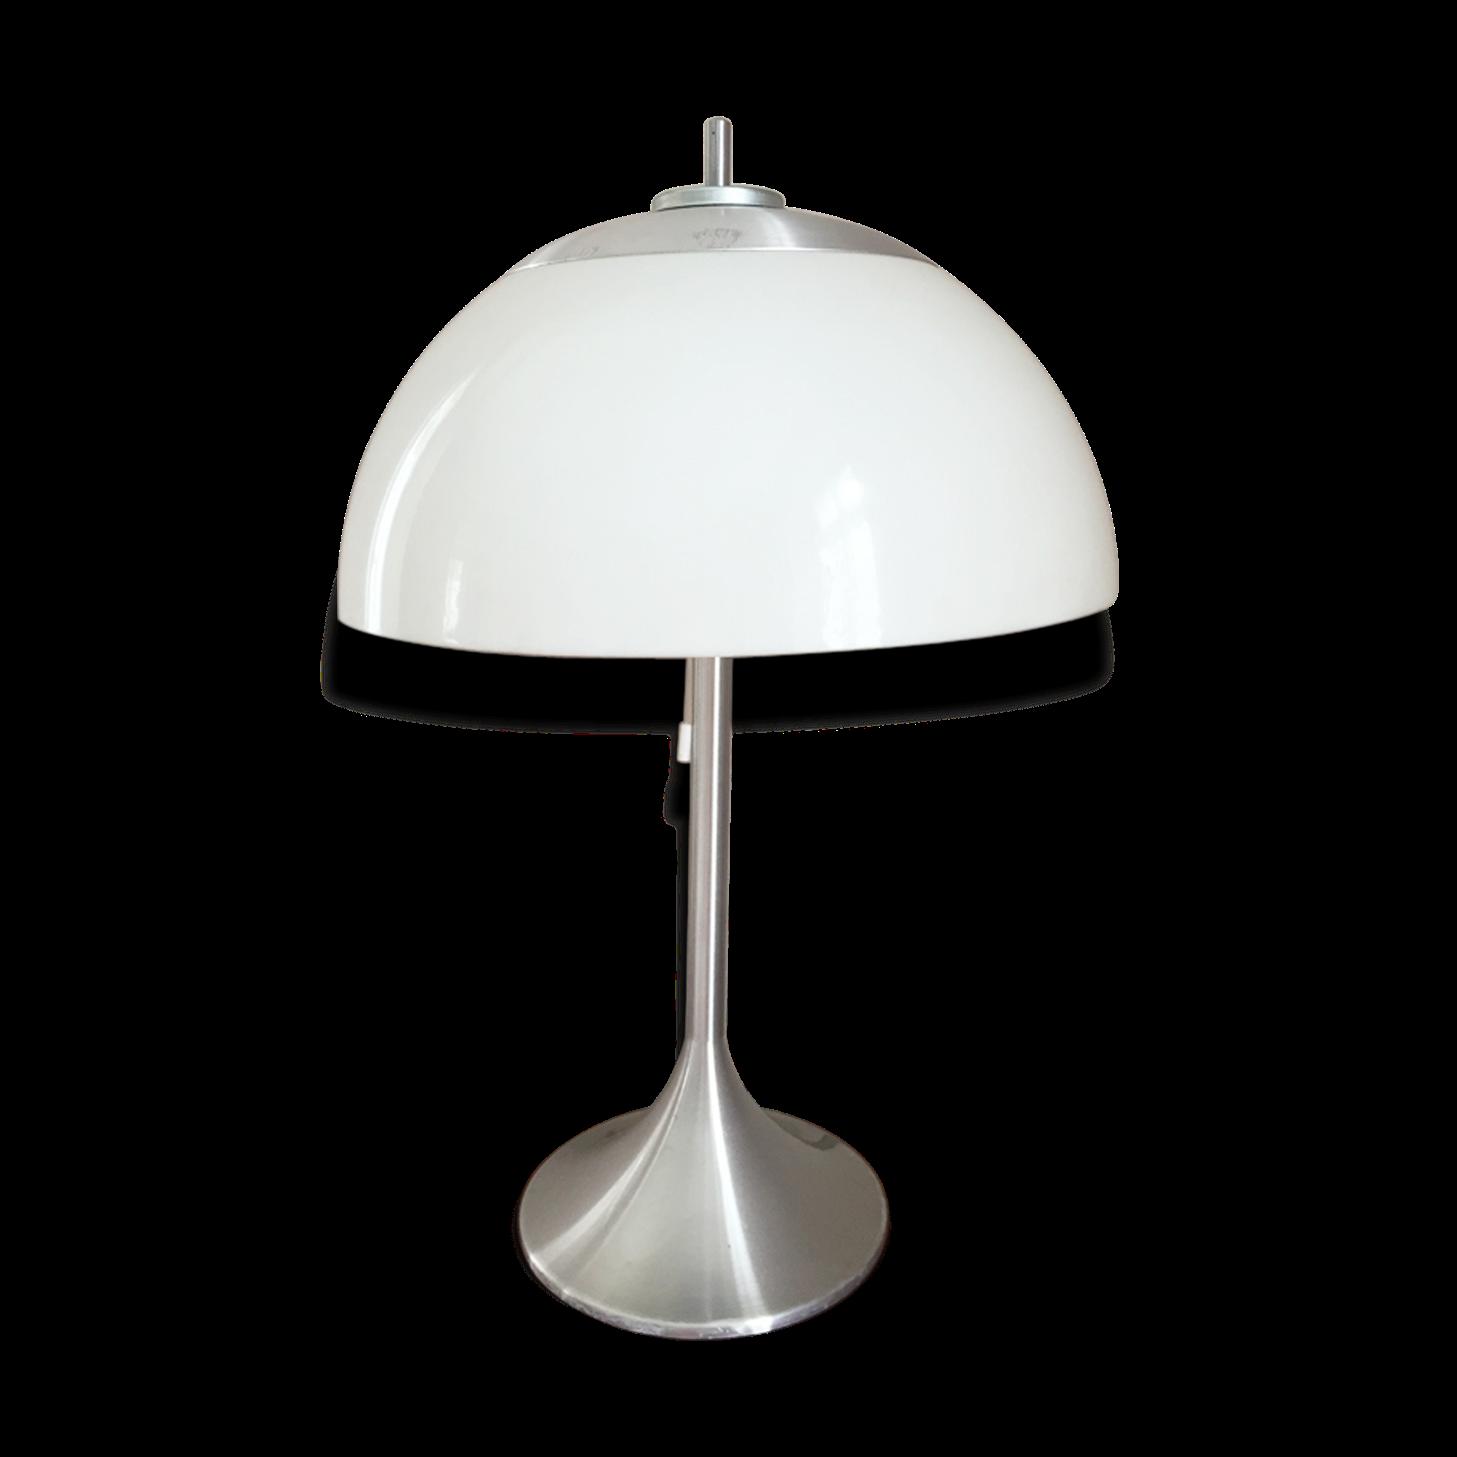 Lampe de bureau champignon Unilux, 1970